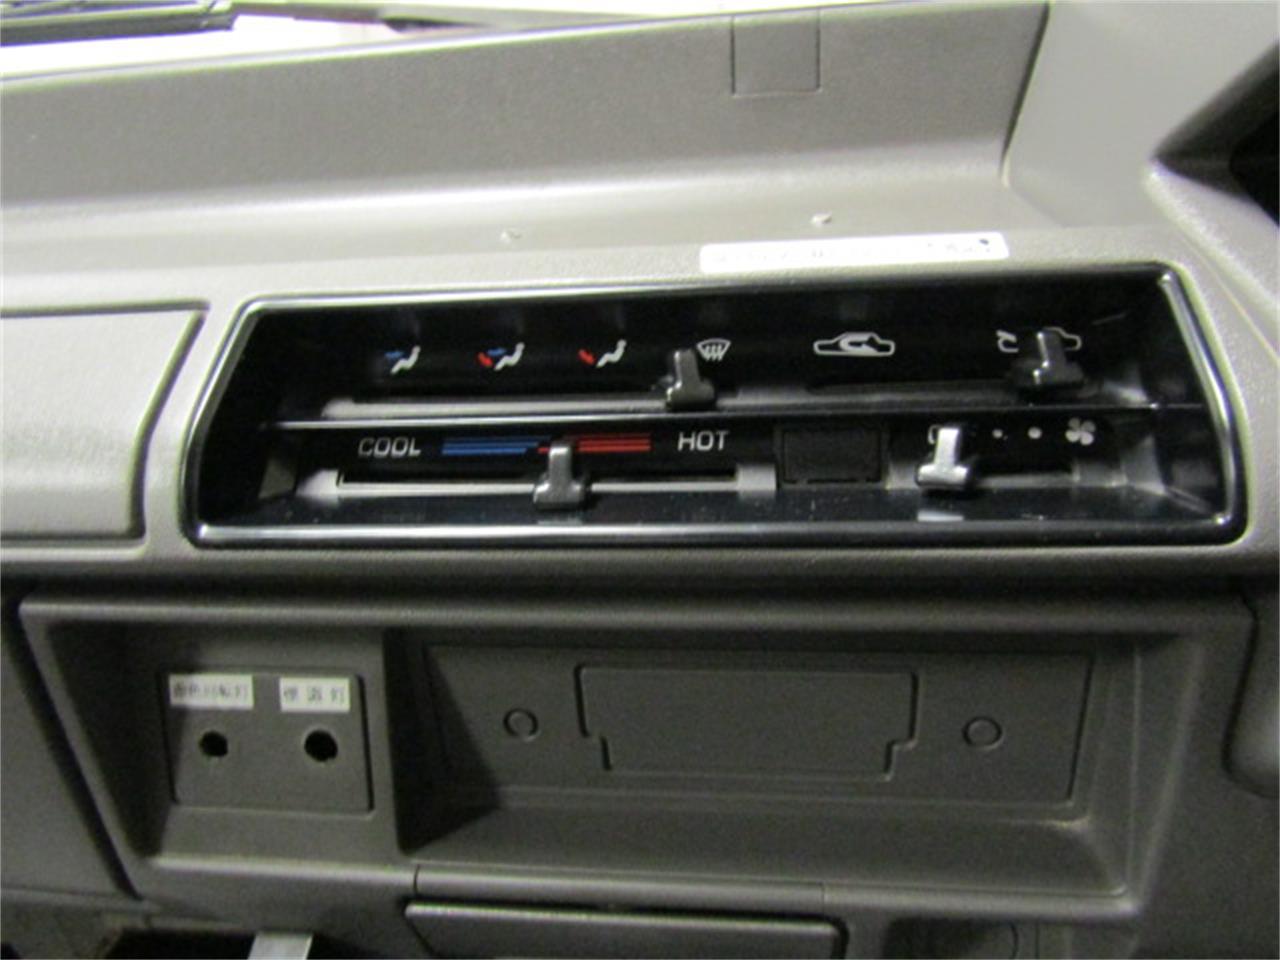 Large Picture of 1991 Suzuki Carry located in Virginia - $7,989.00 - KIFI